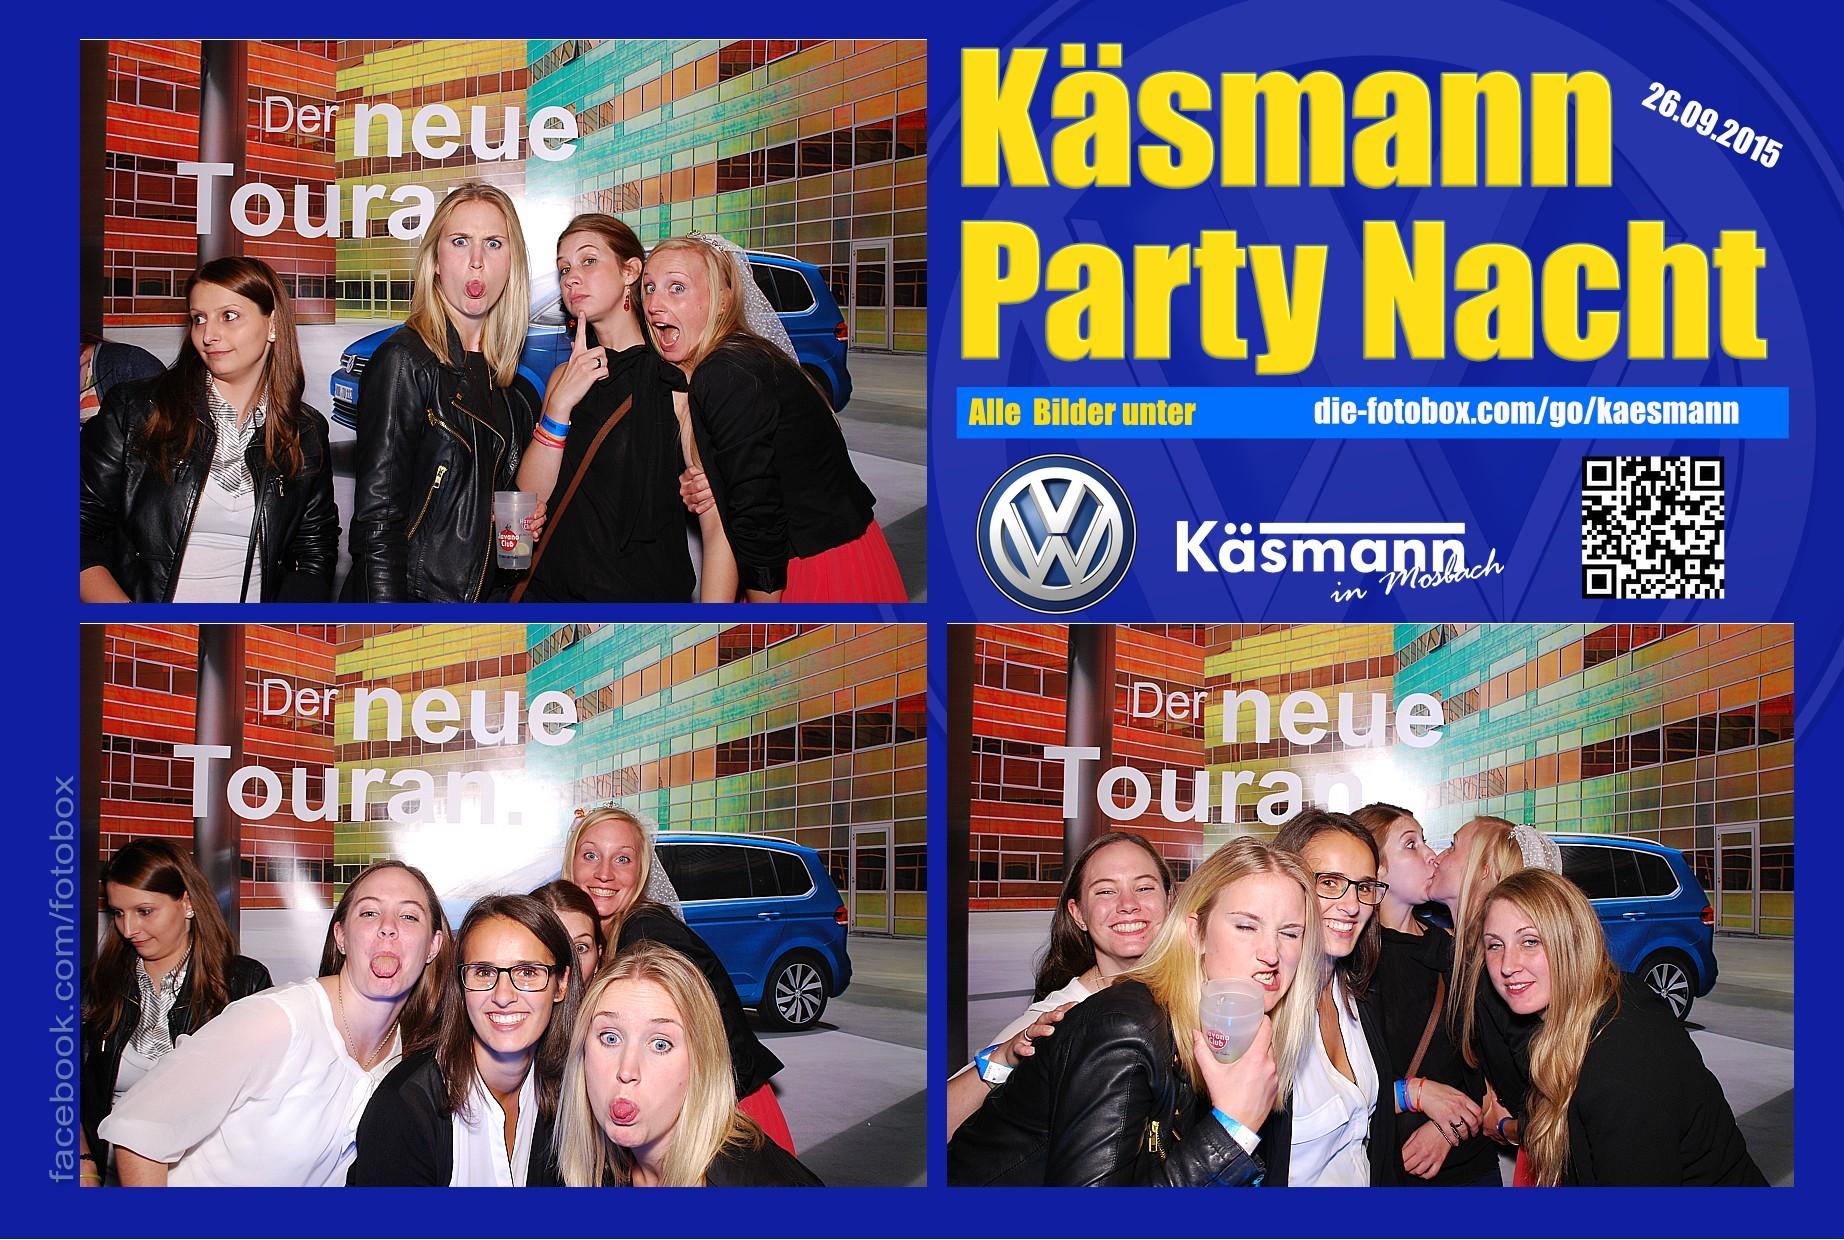 Käsmannparty 2015 - www.die-fotobox.com 01008